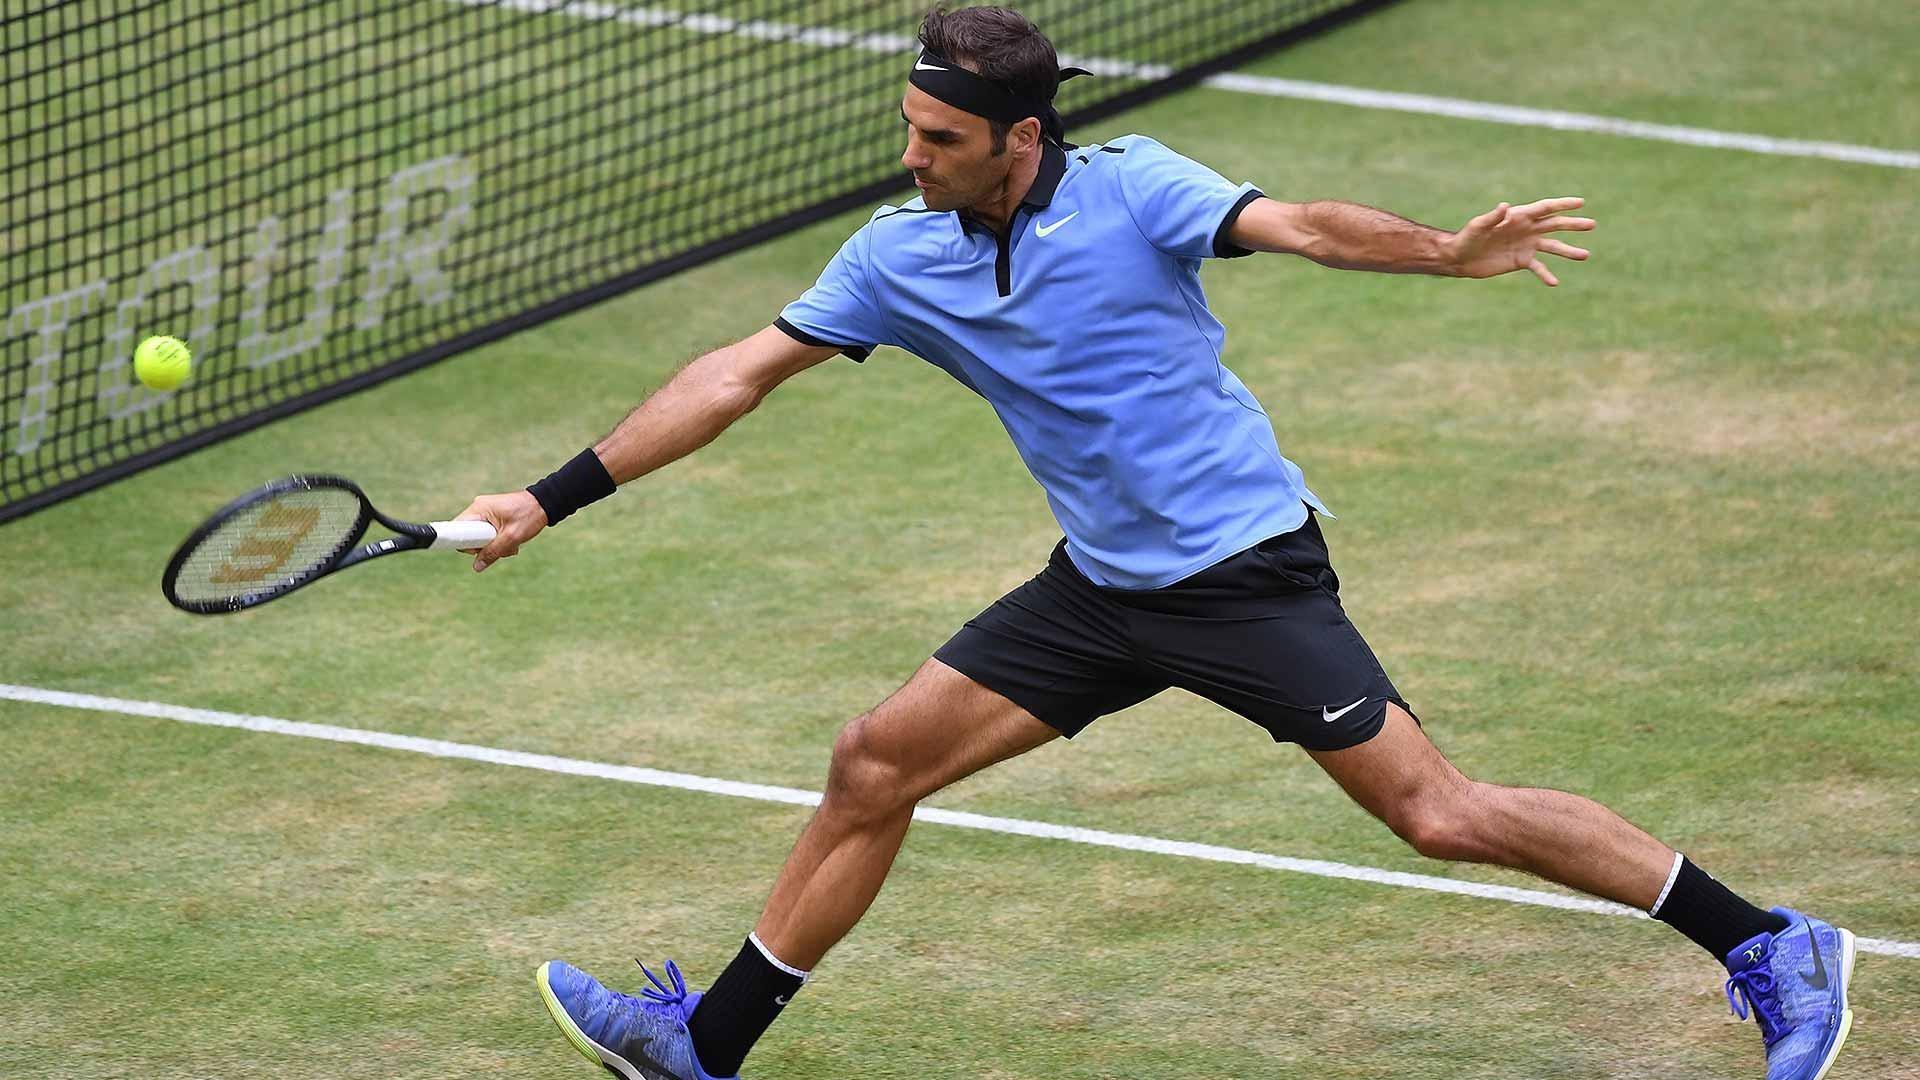 Tenniskleding van bekende proftennissers